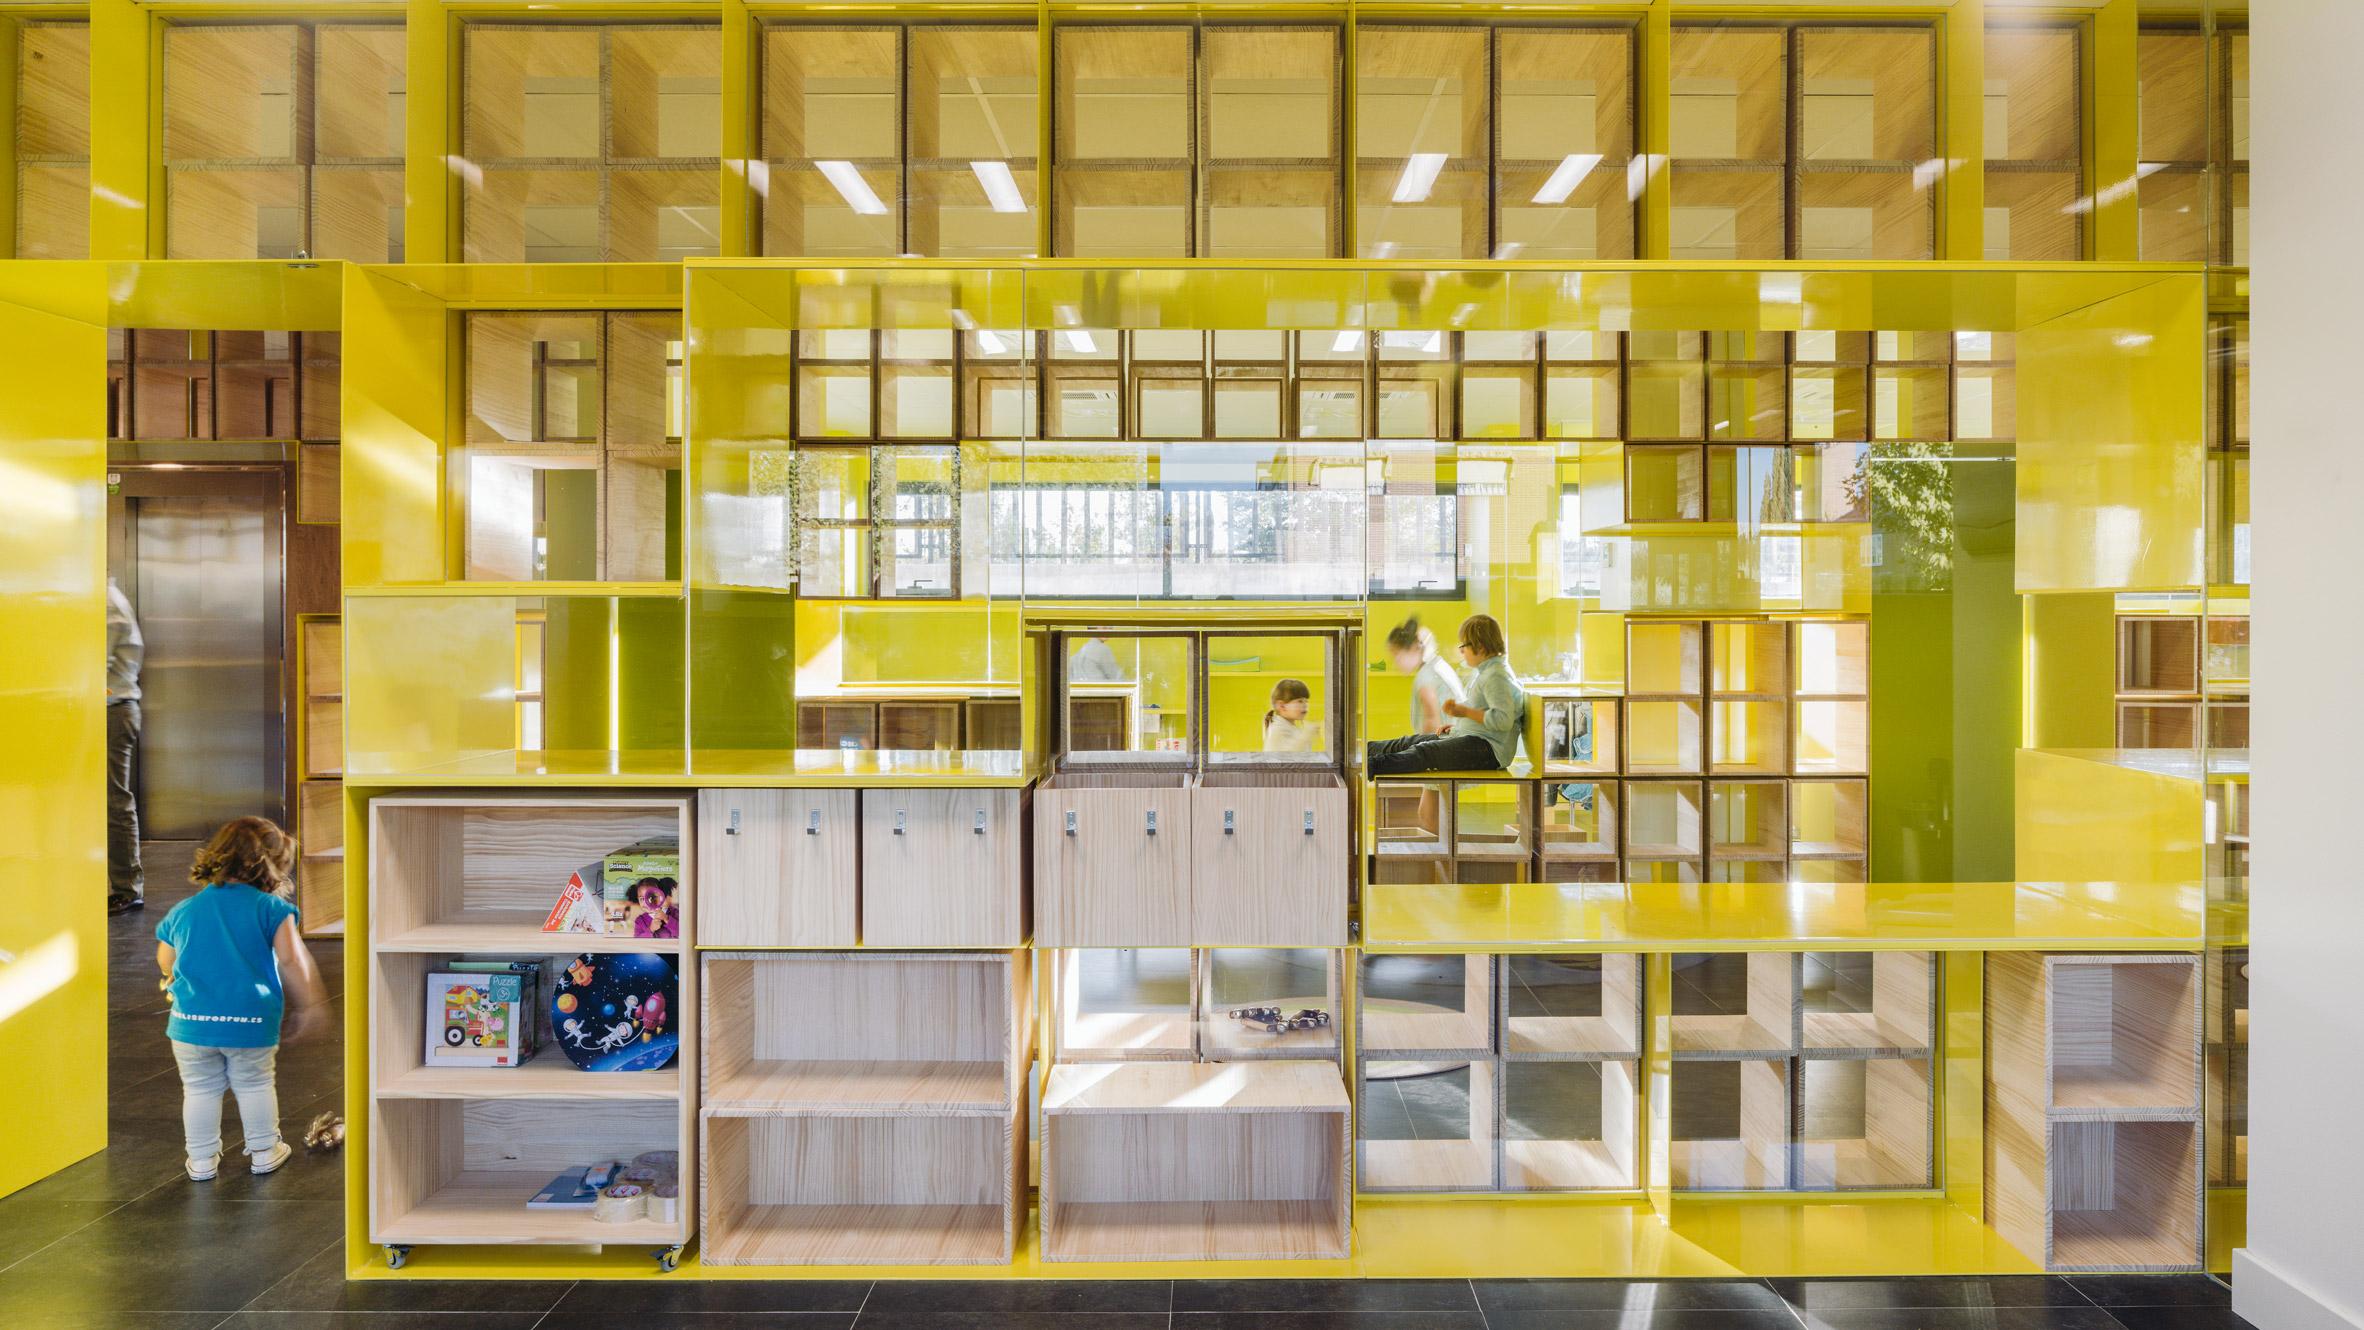 degree architecture newschool schools bachelor space design interior of academics co school working schoolofdesign